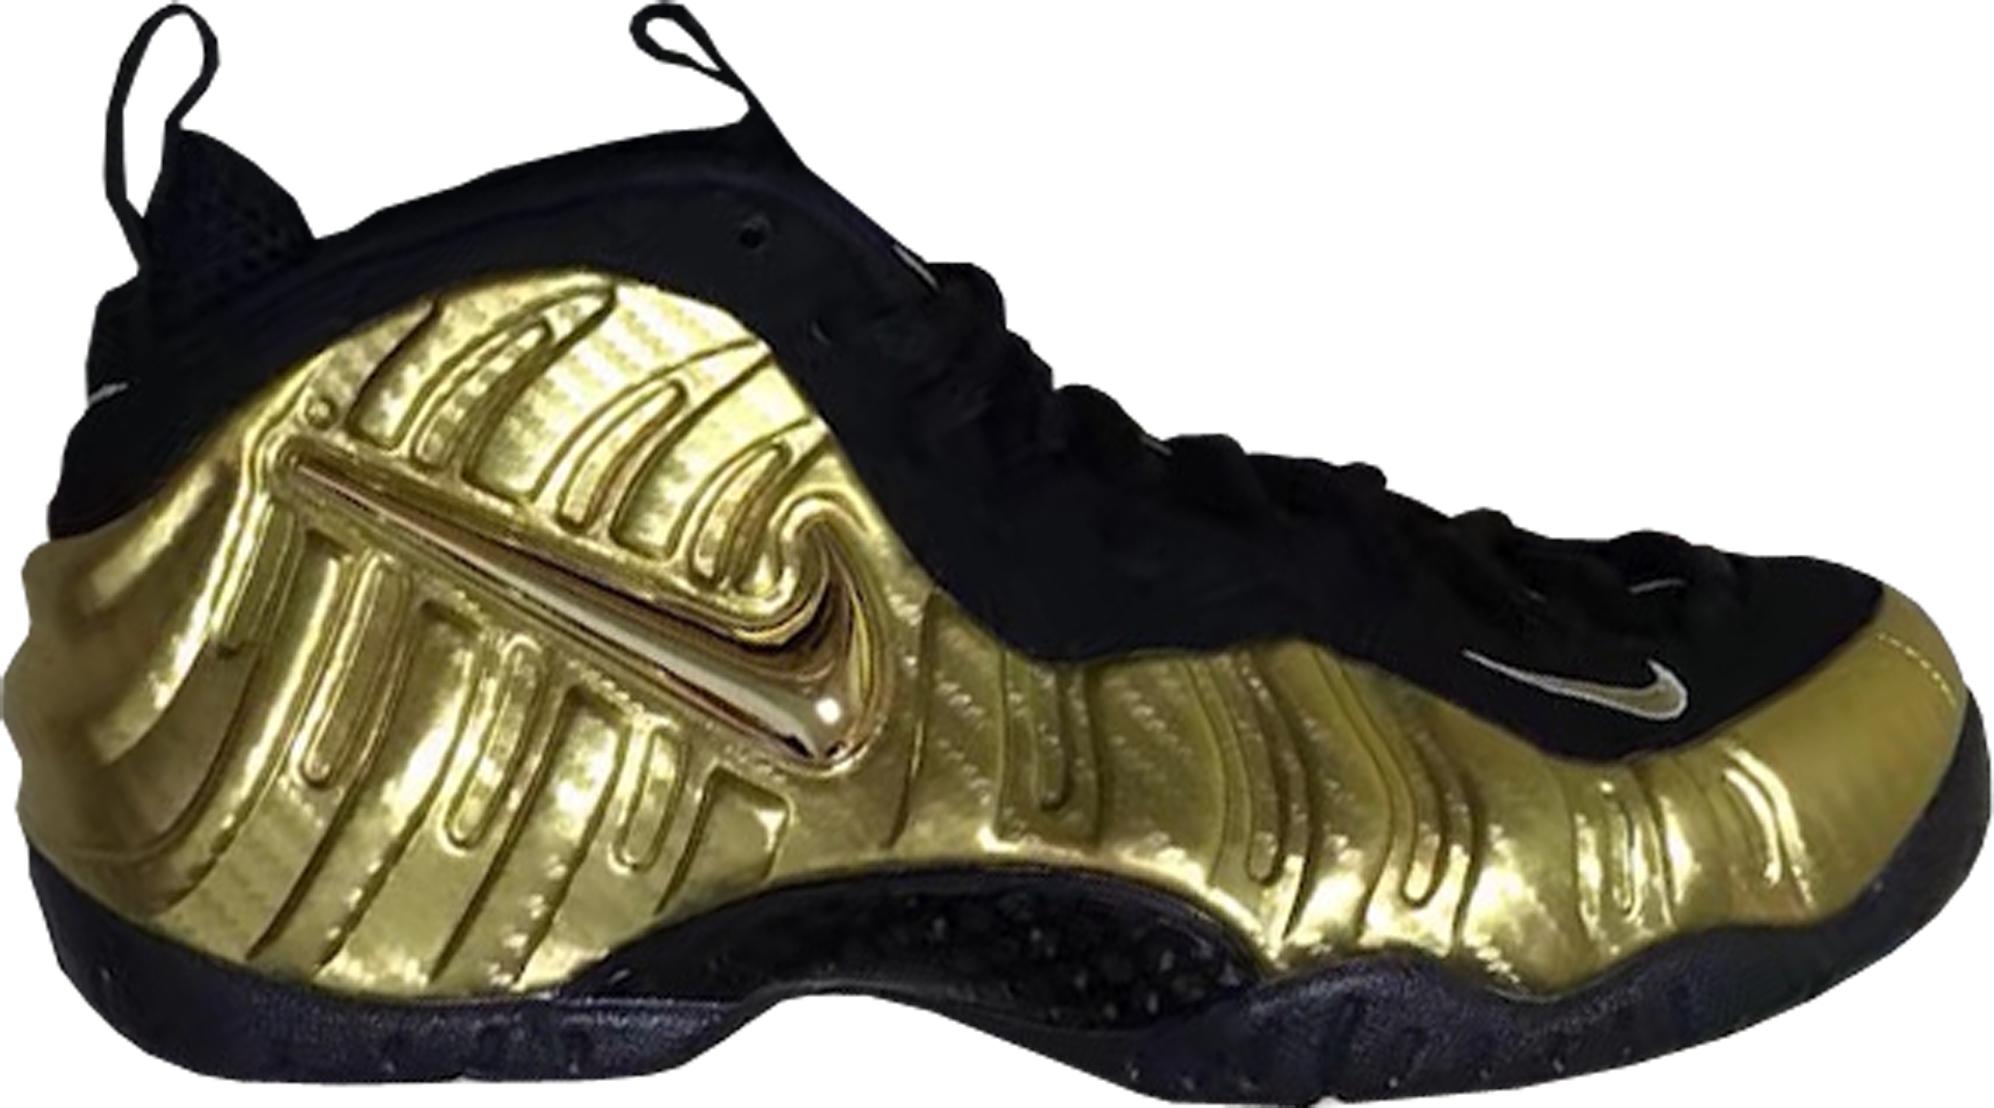 Nike Foamposite Pro Metallic Gold